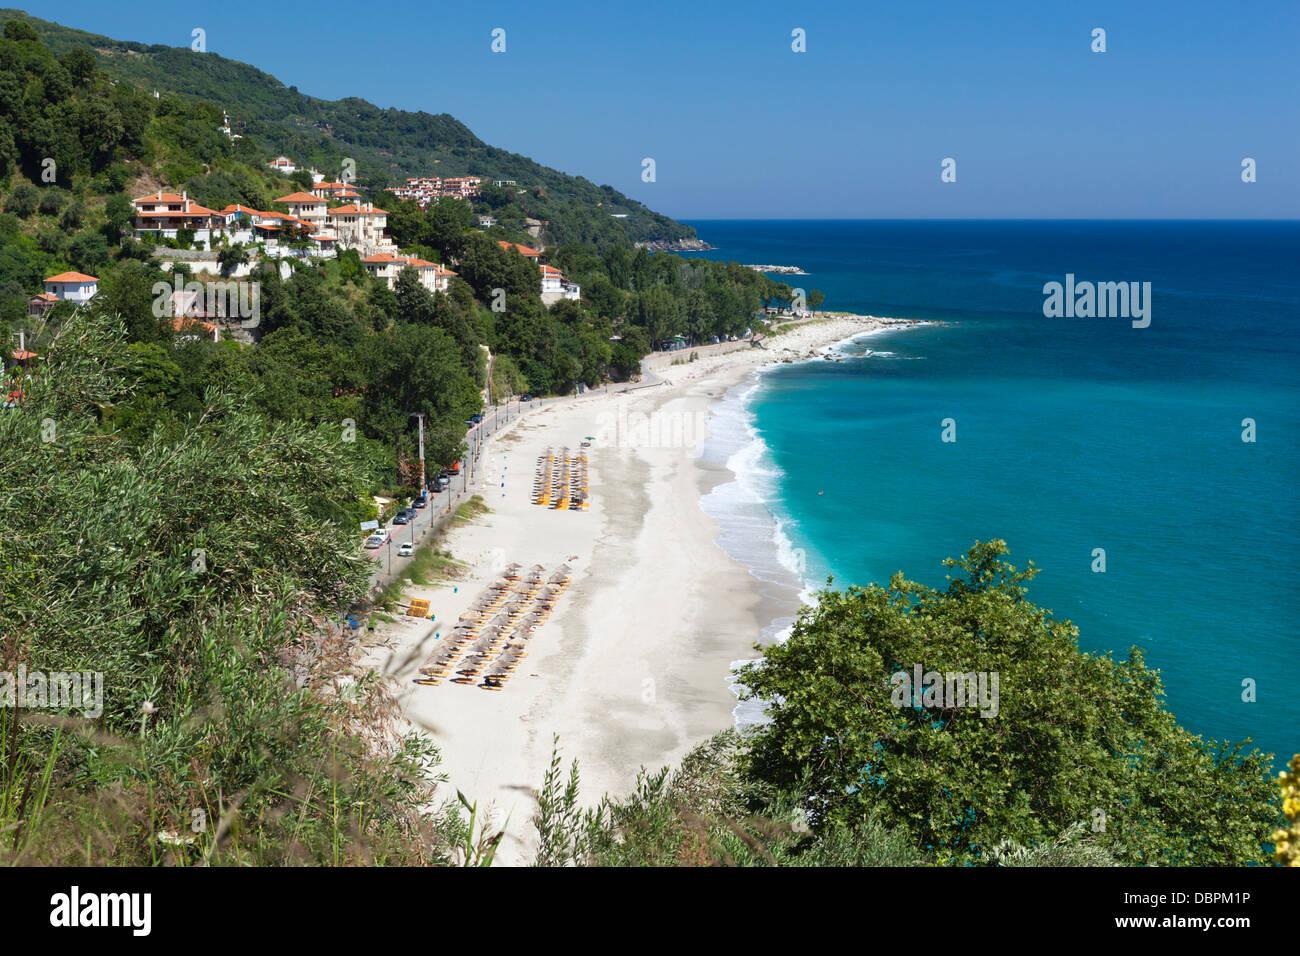 Papa Nero beach, Agios Ioannis, Pelion, Thessaly, Greece, Europe - Stock Image